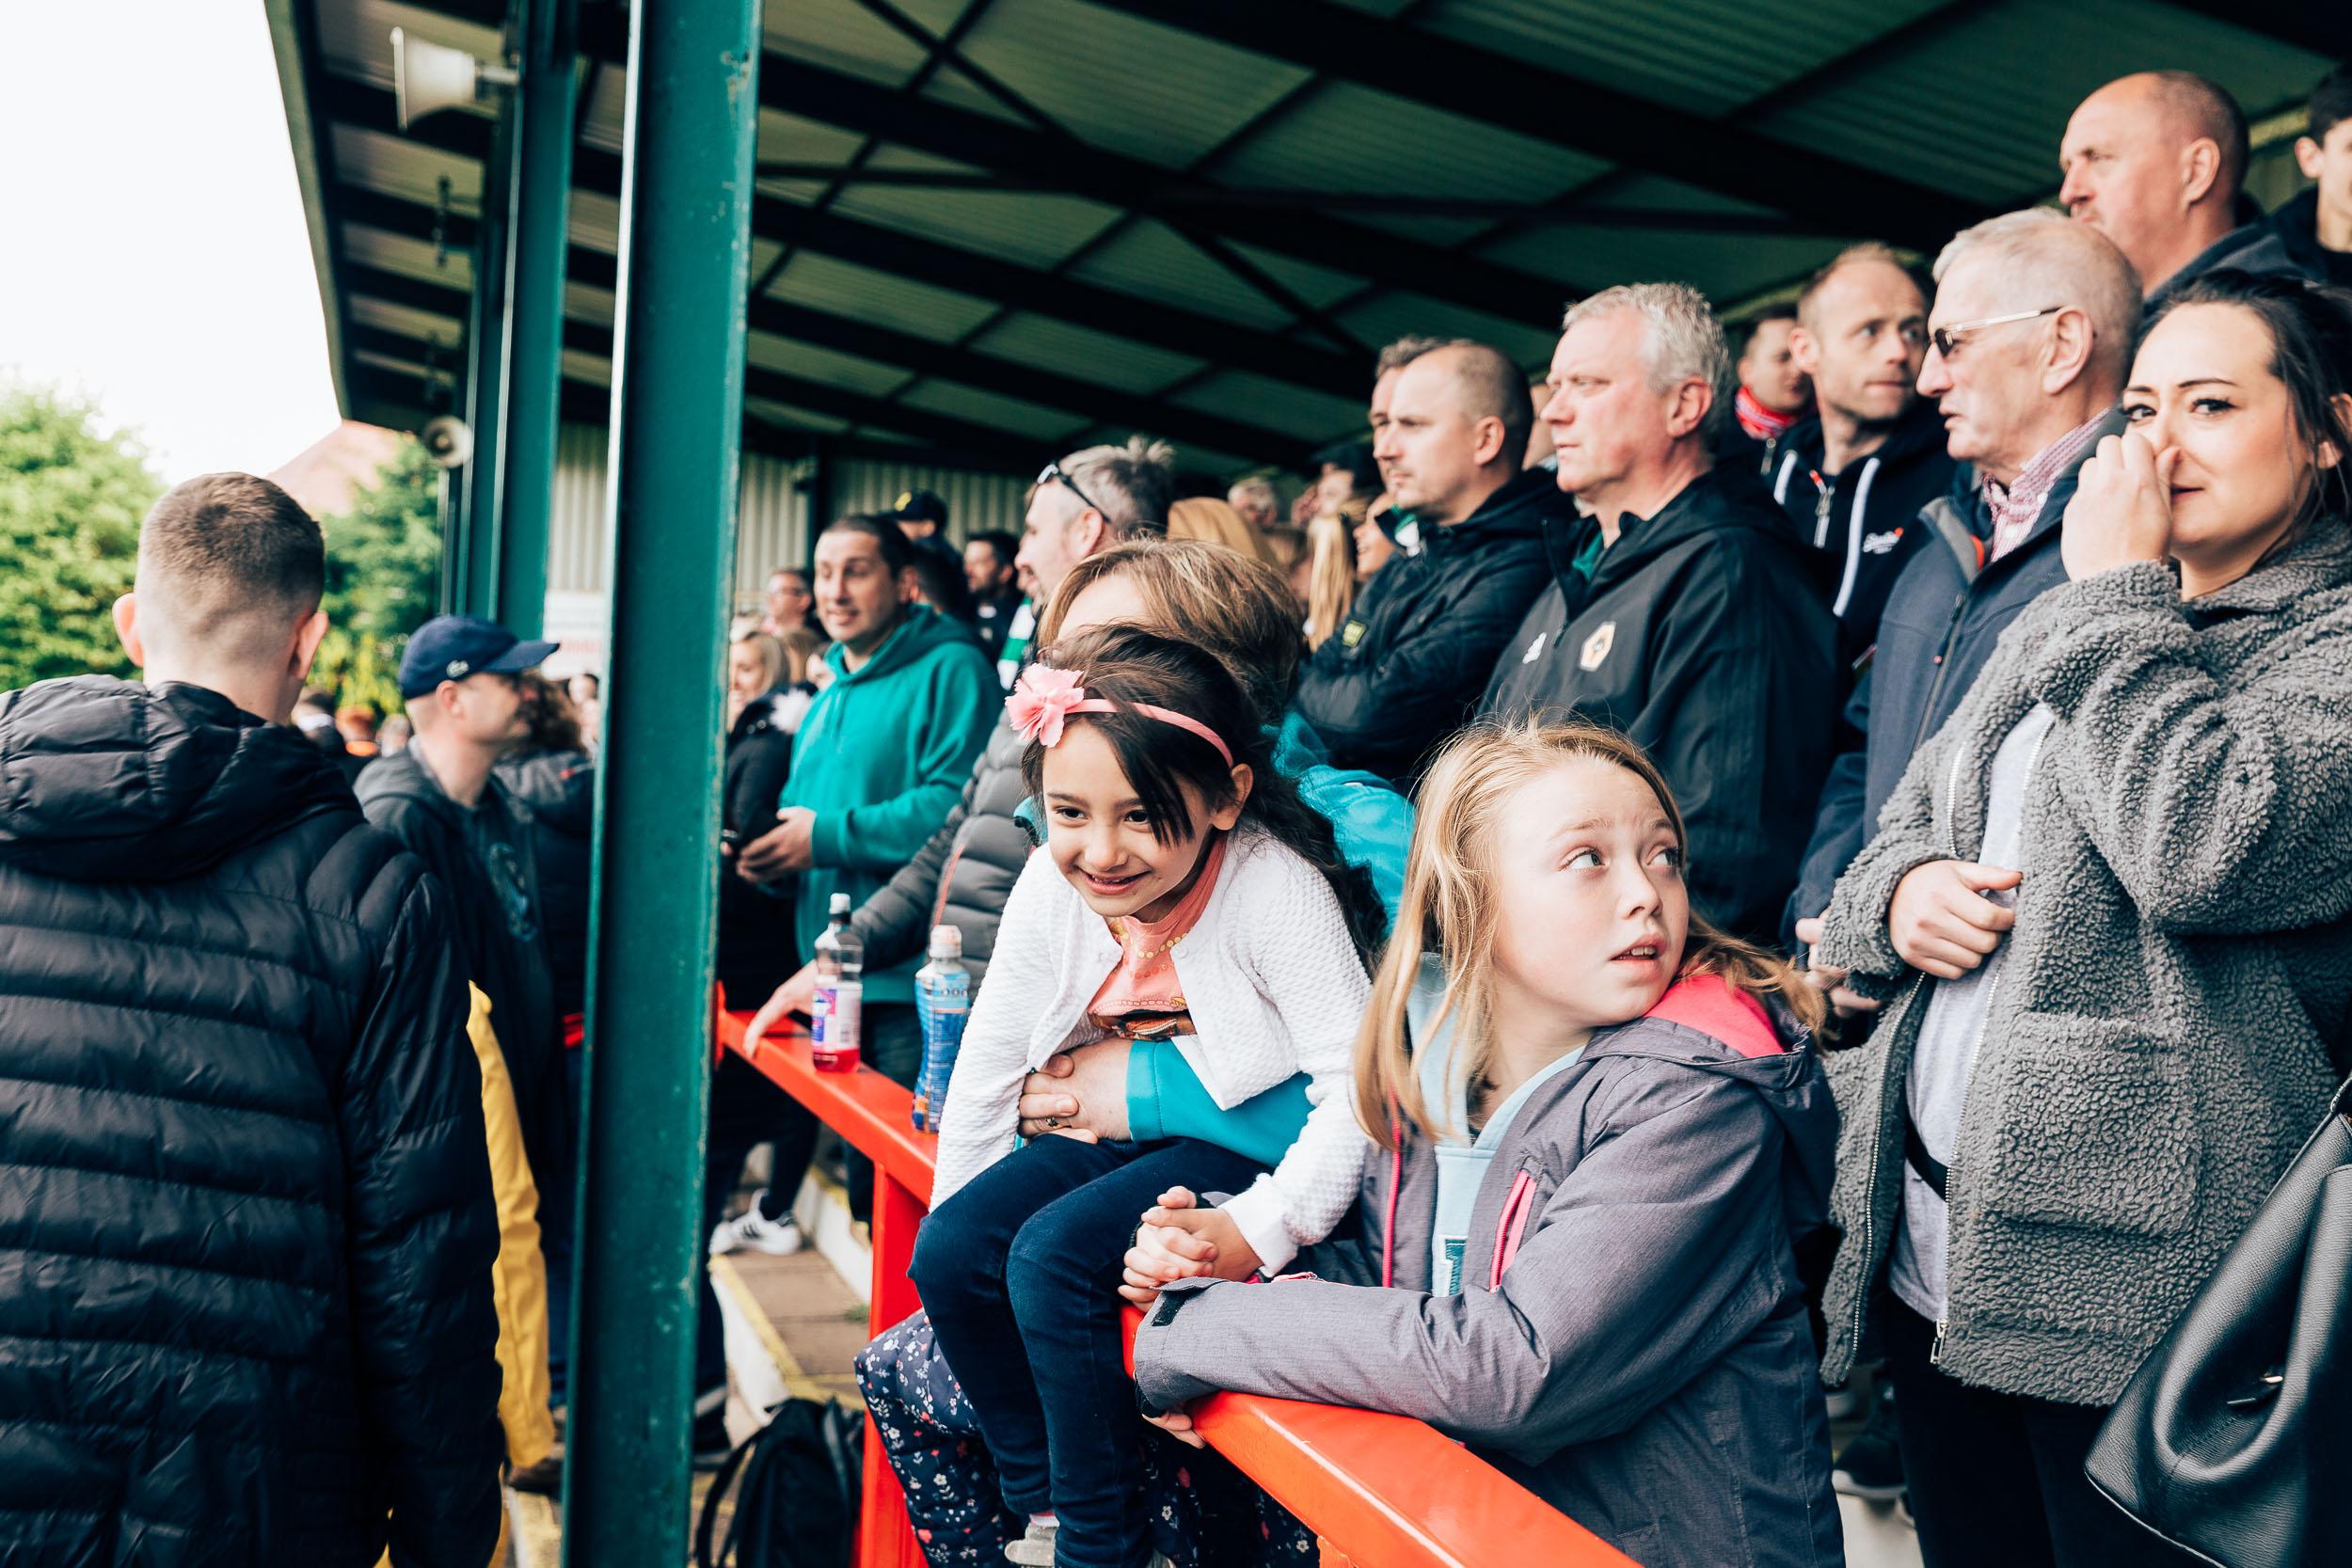 06_05_2019_Bromsgrove_Sporting_Corby-35.jpg